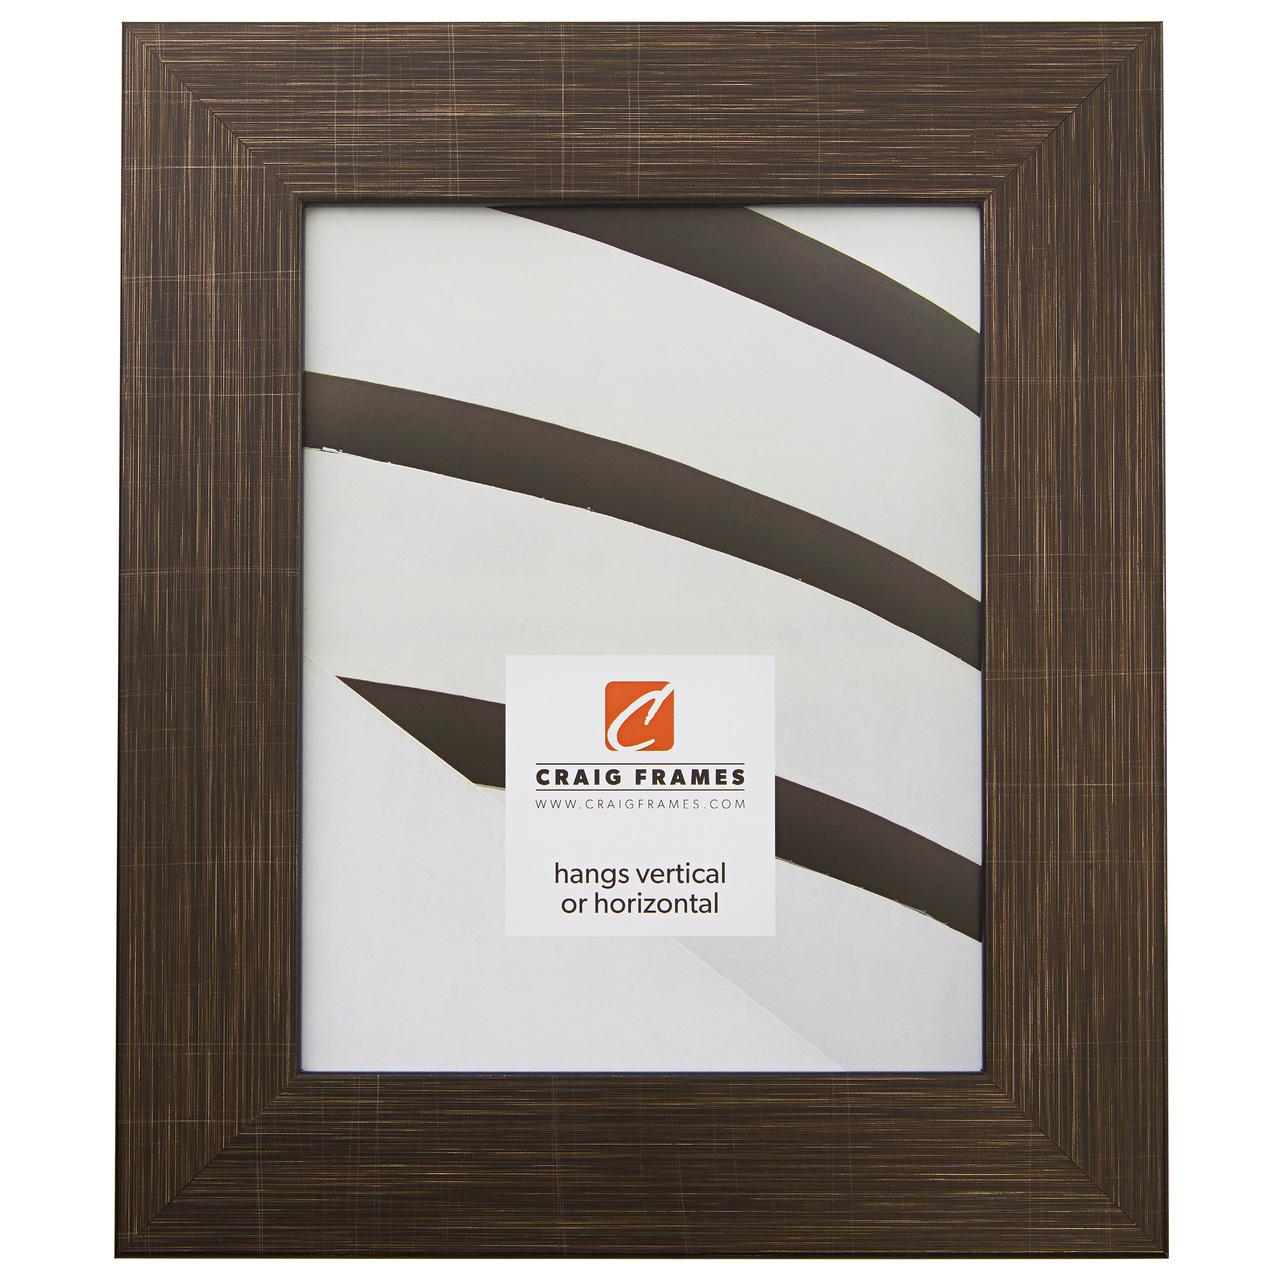 "Bauhaus 200 2"", Scratched Black Picture Frame"